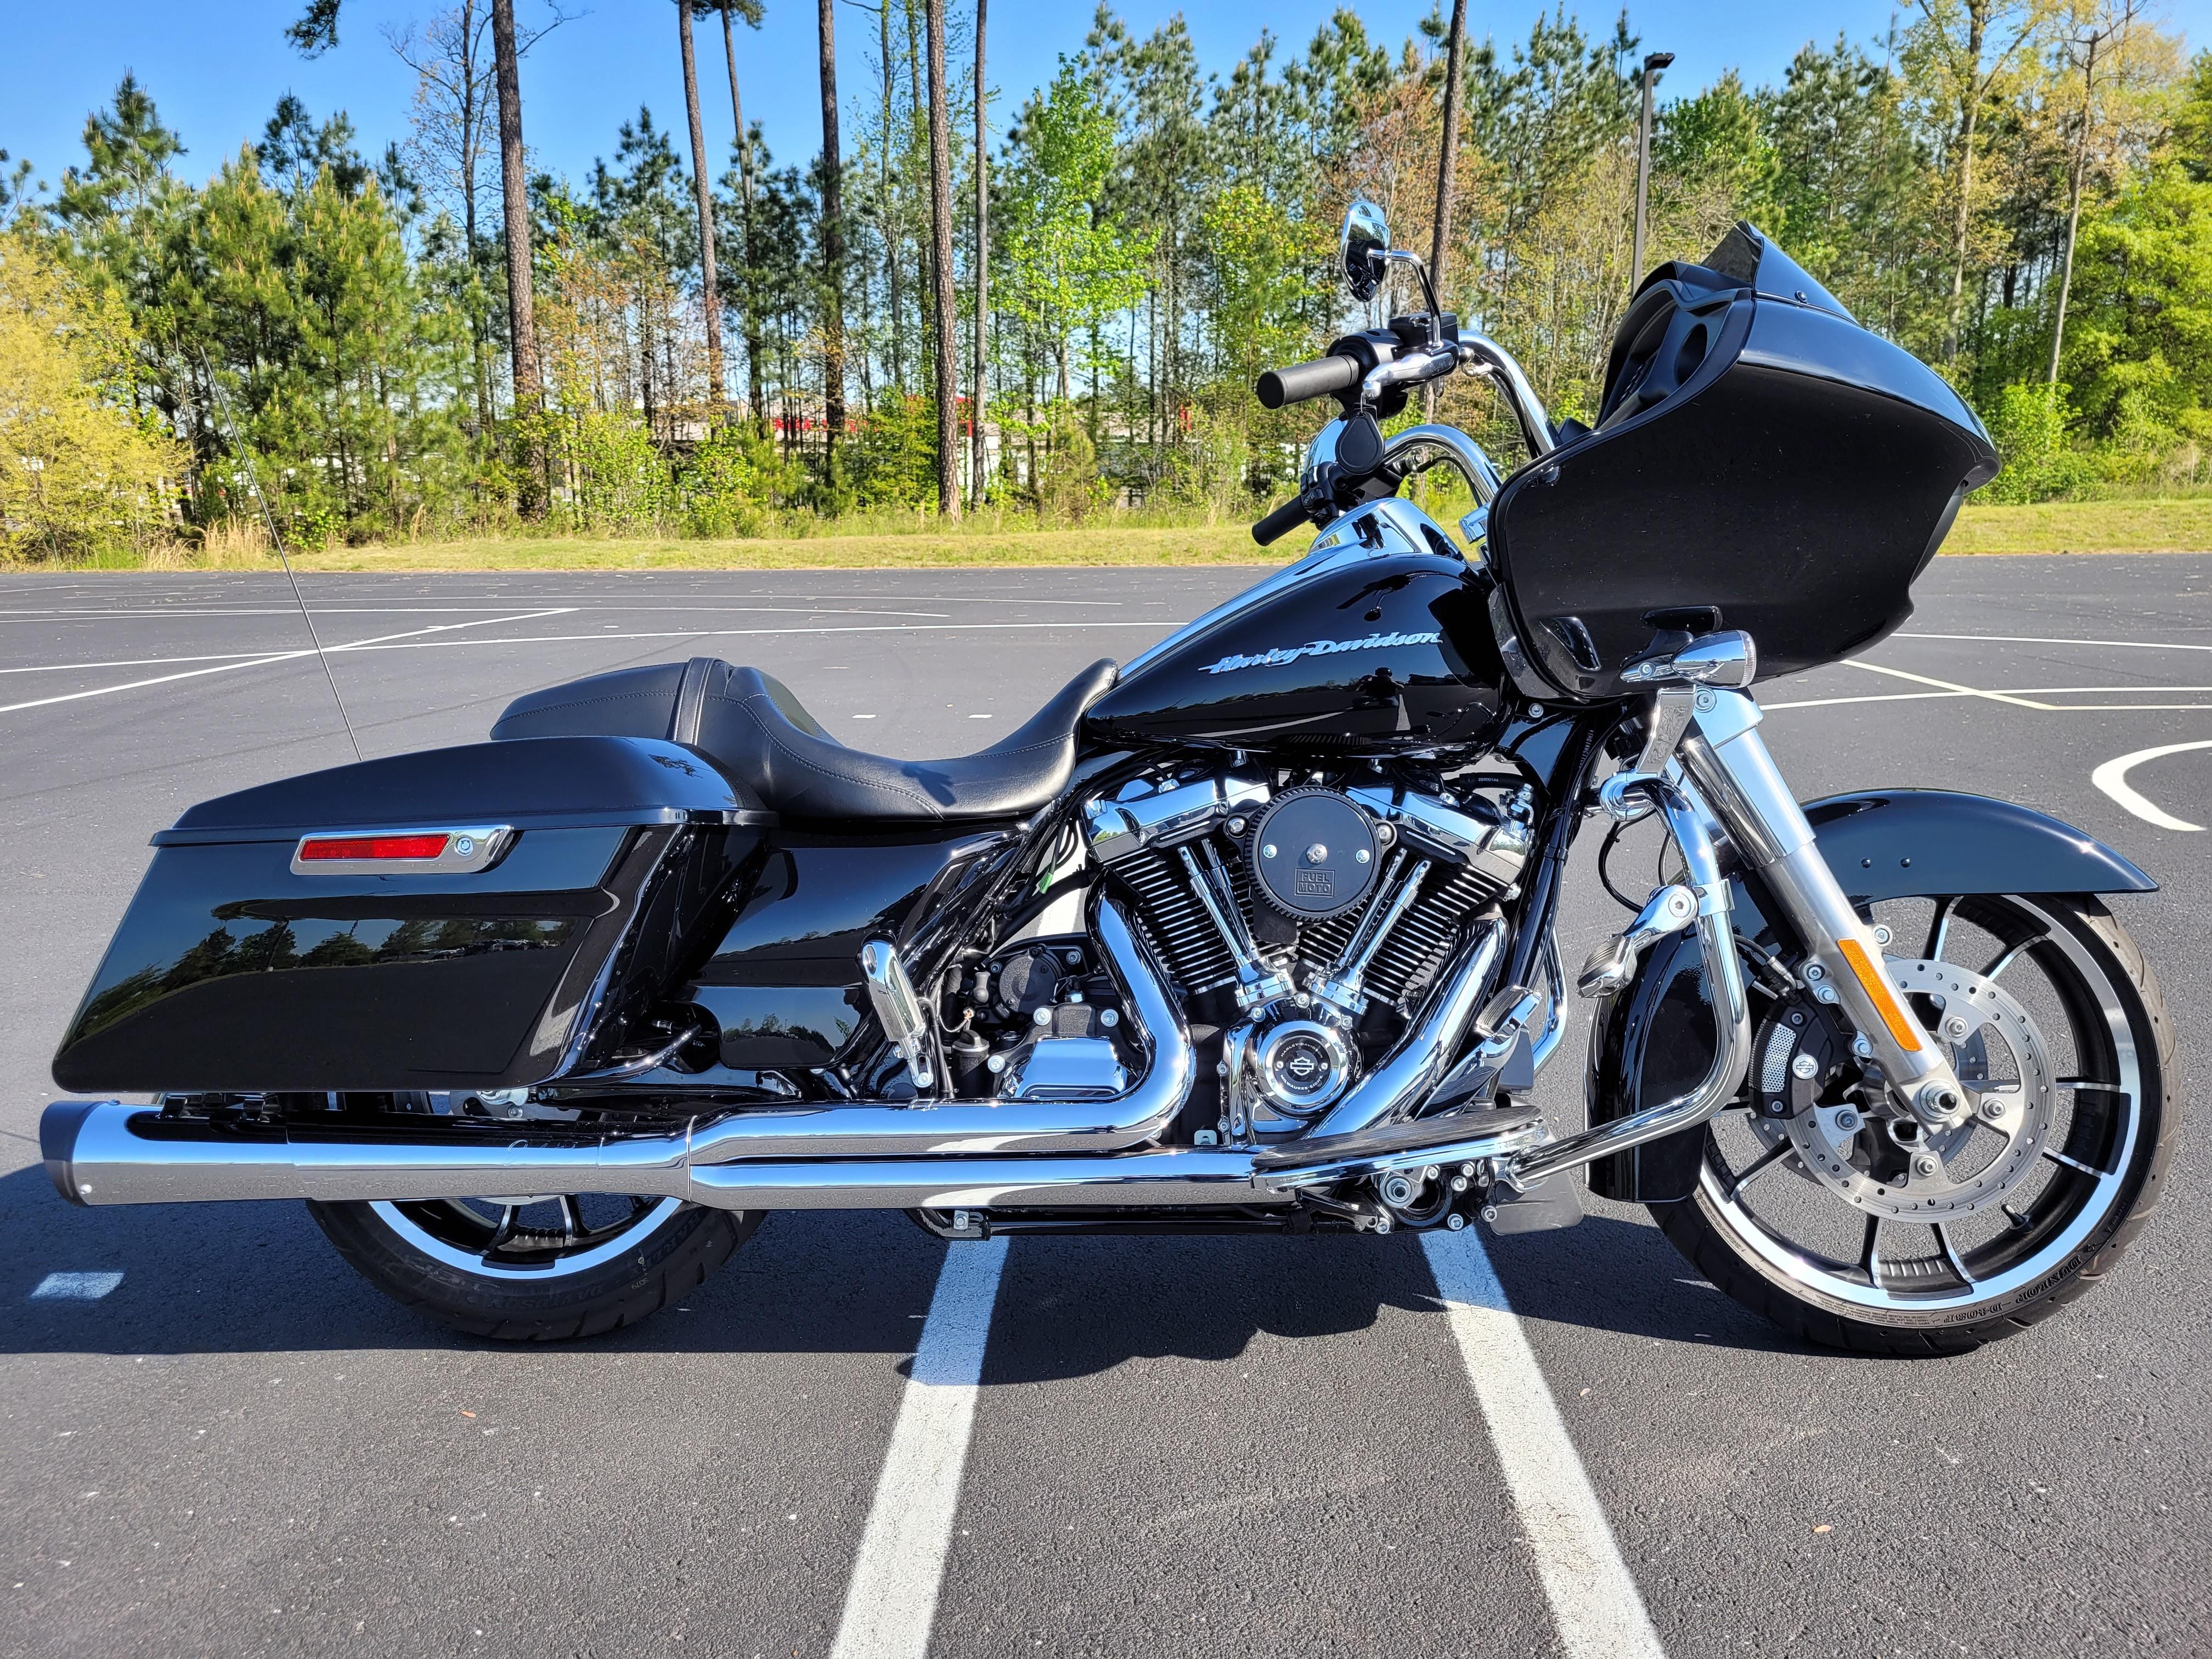 2020 Harley-Davidson Touring Road Glide at Richmond Harley-Davidson